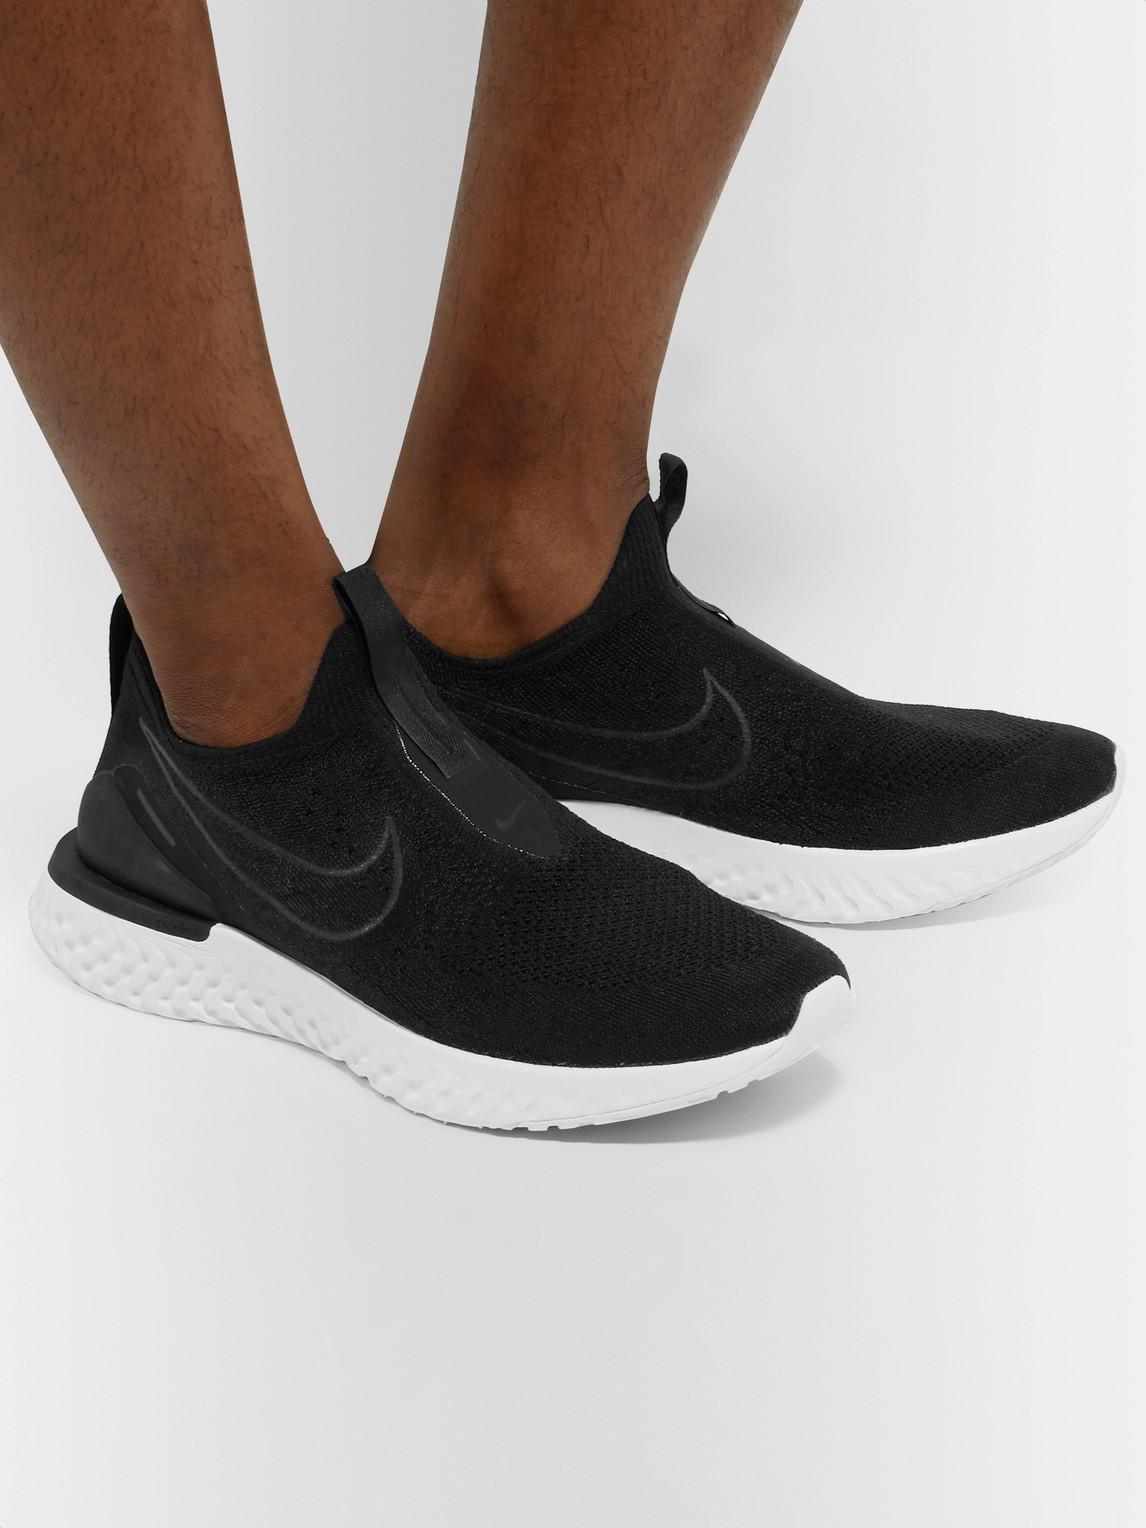 Nike Shoes EPIC PHANTOM REACT FLYKNIT SLIP